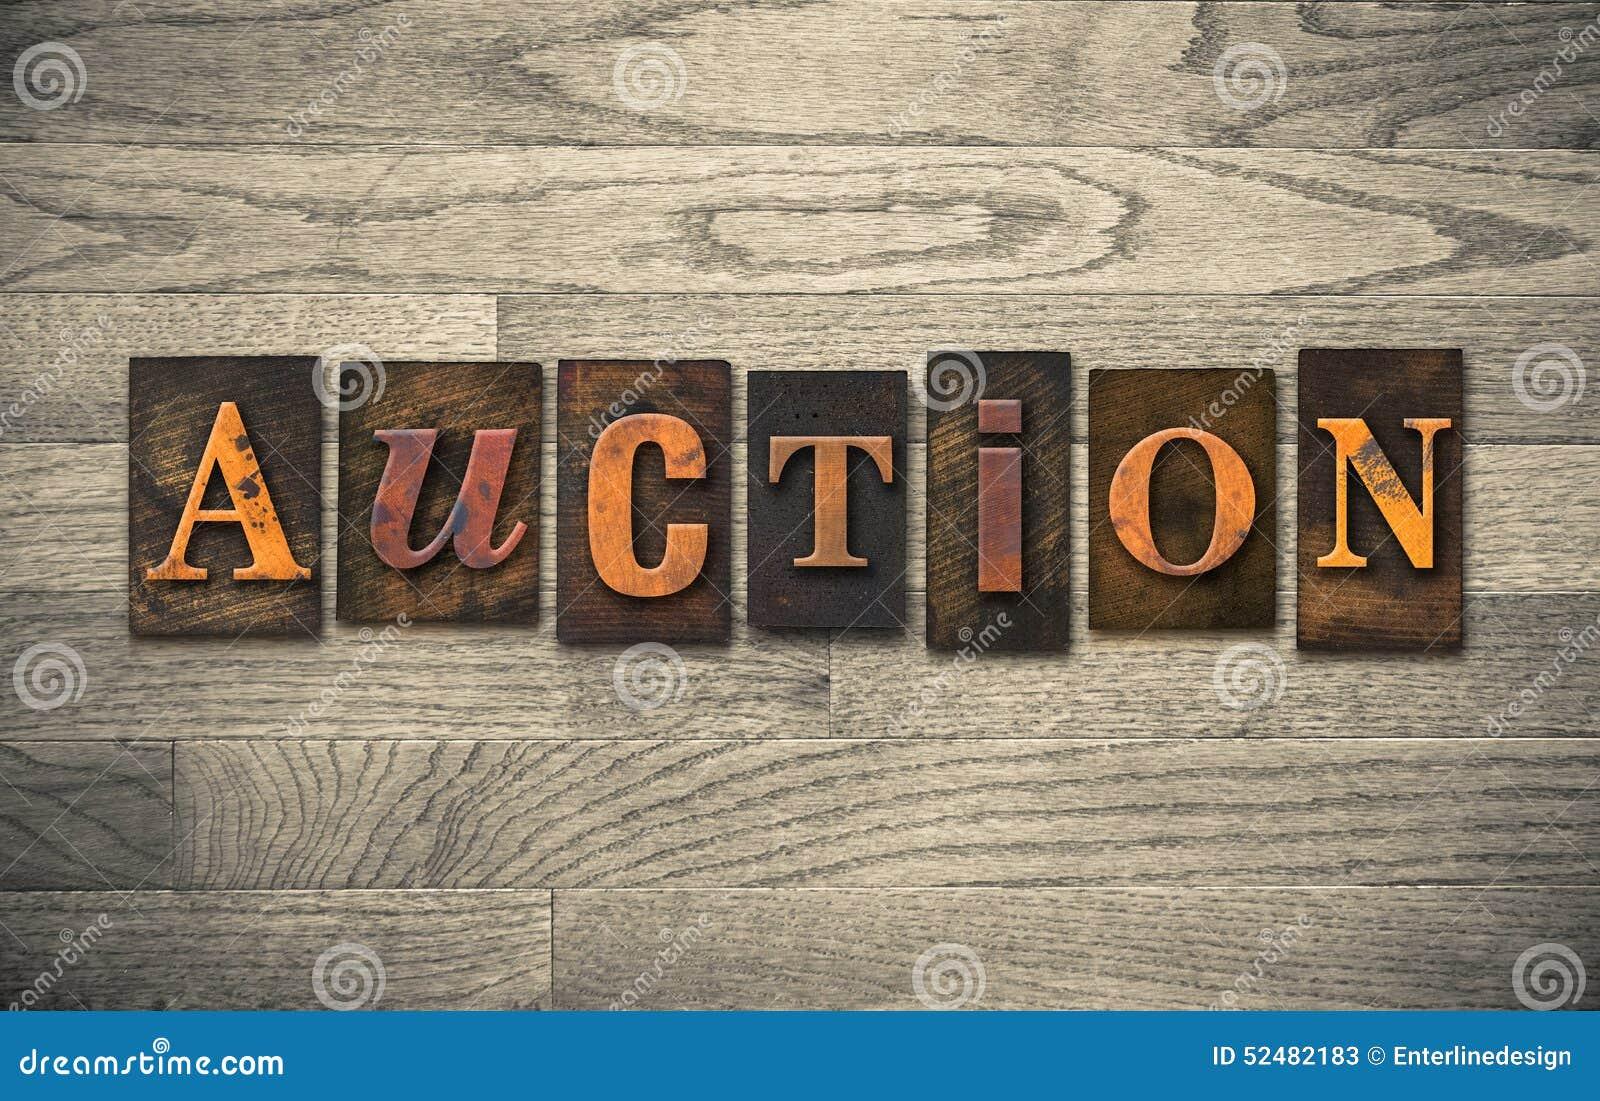 auction wooden letterpress theme stock photo